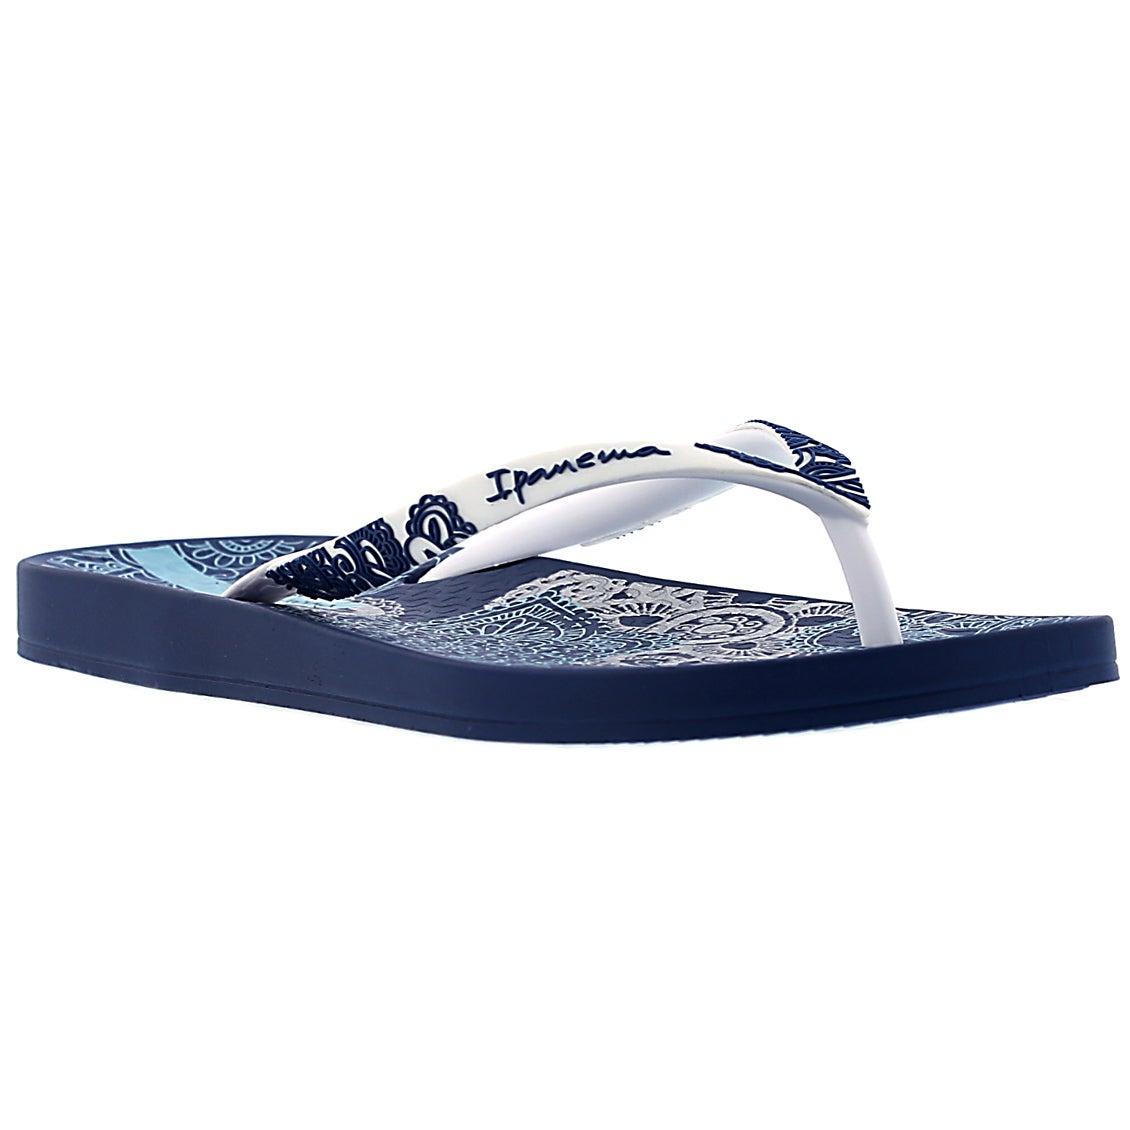 Lds Lace blue/white printed flip flop